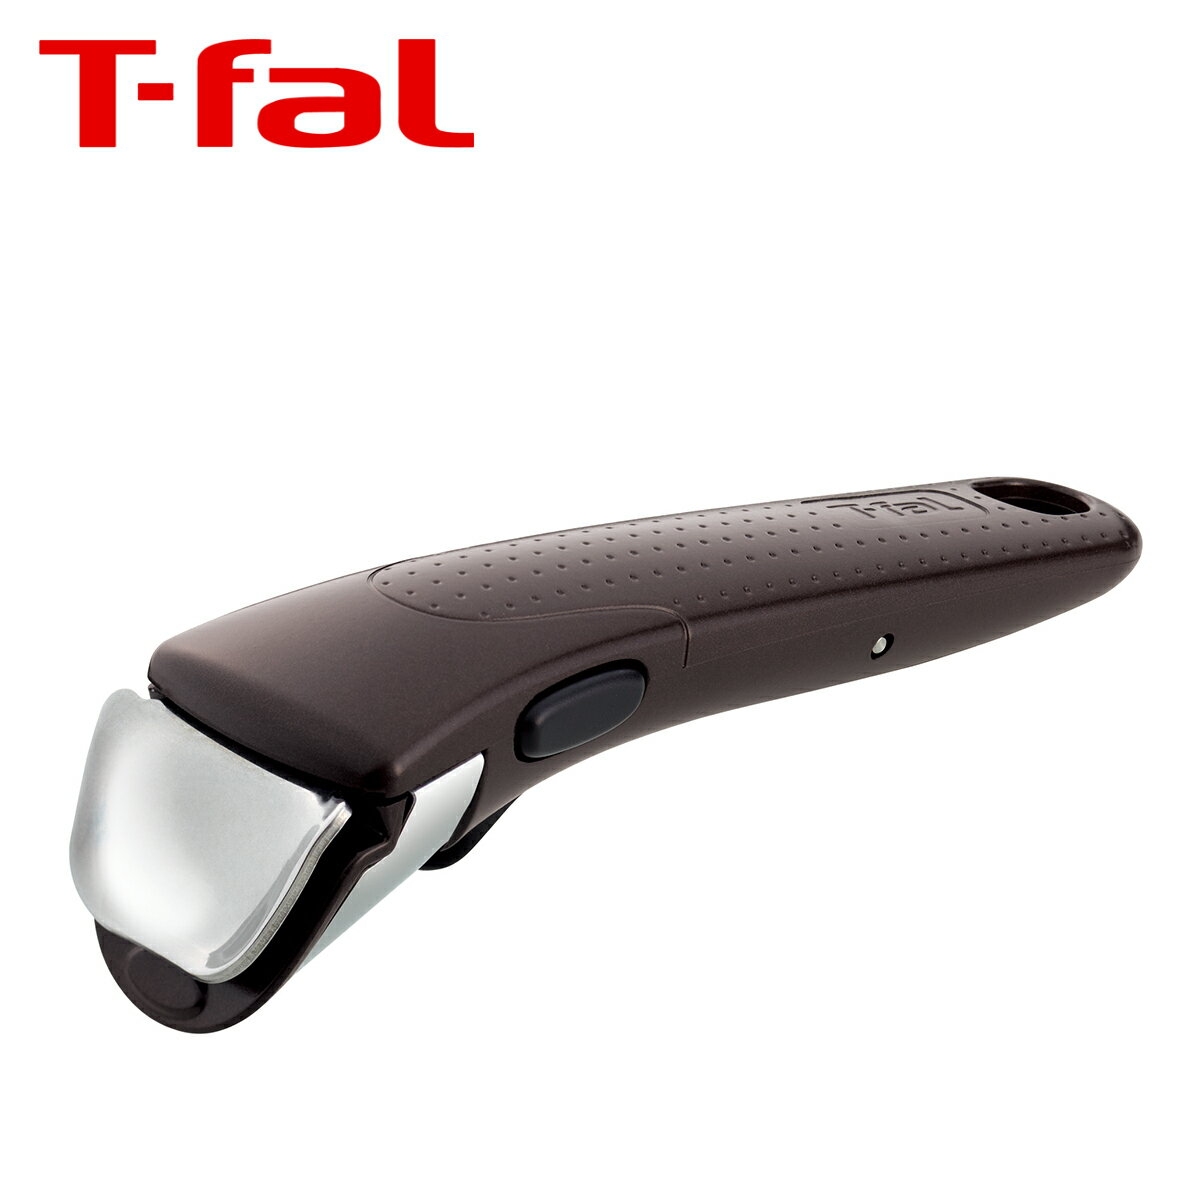 T-fal(ティファール)インジニオ・ネオシリーズ専用取っ手 モカ N L99345